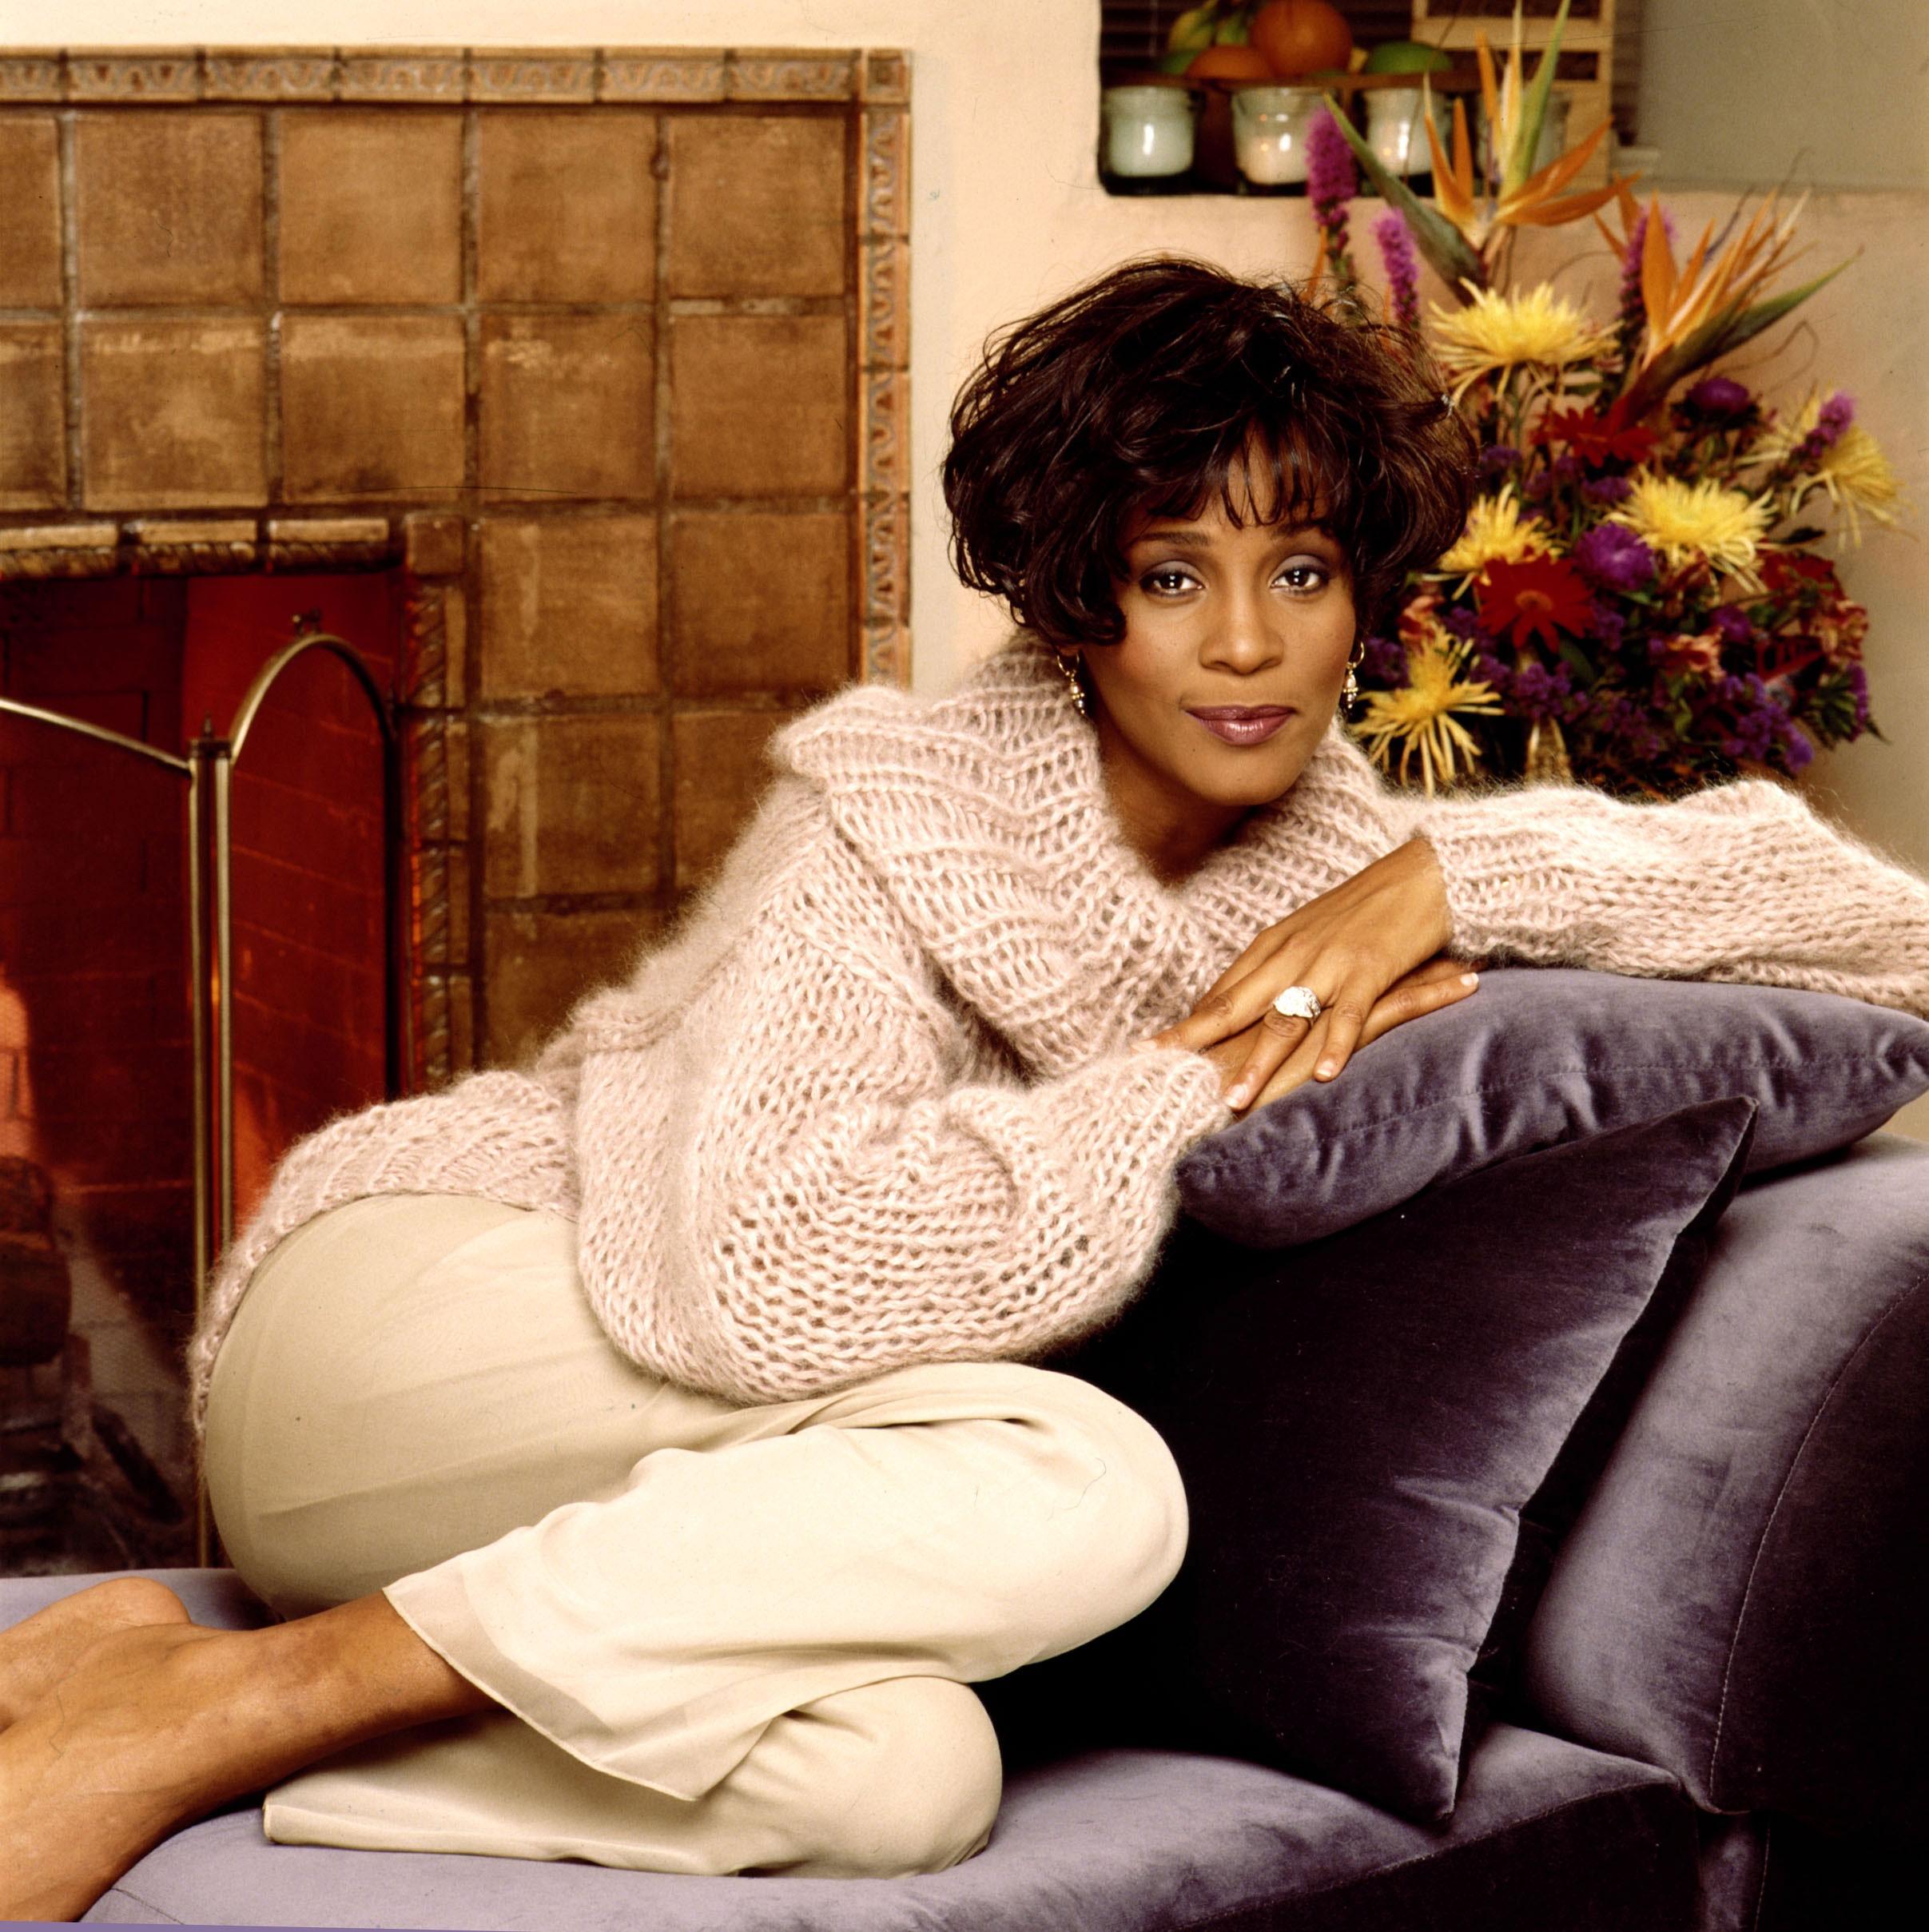 Whitney Houston Kimdir? Whitney Houston Boyu Kaç, Kilosu Kaç, Aslen Nereli, Sevgilisi Kimdir? - 2